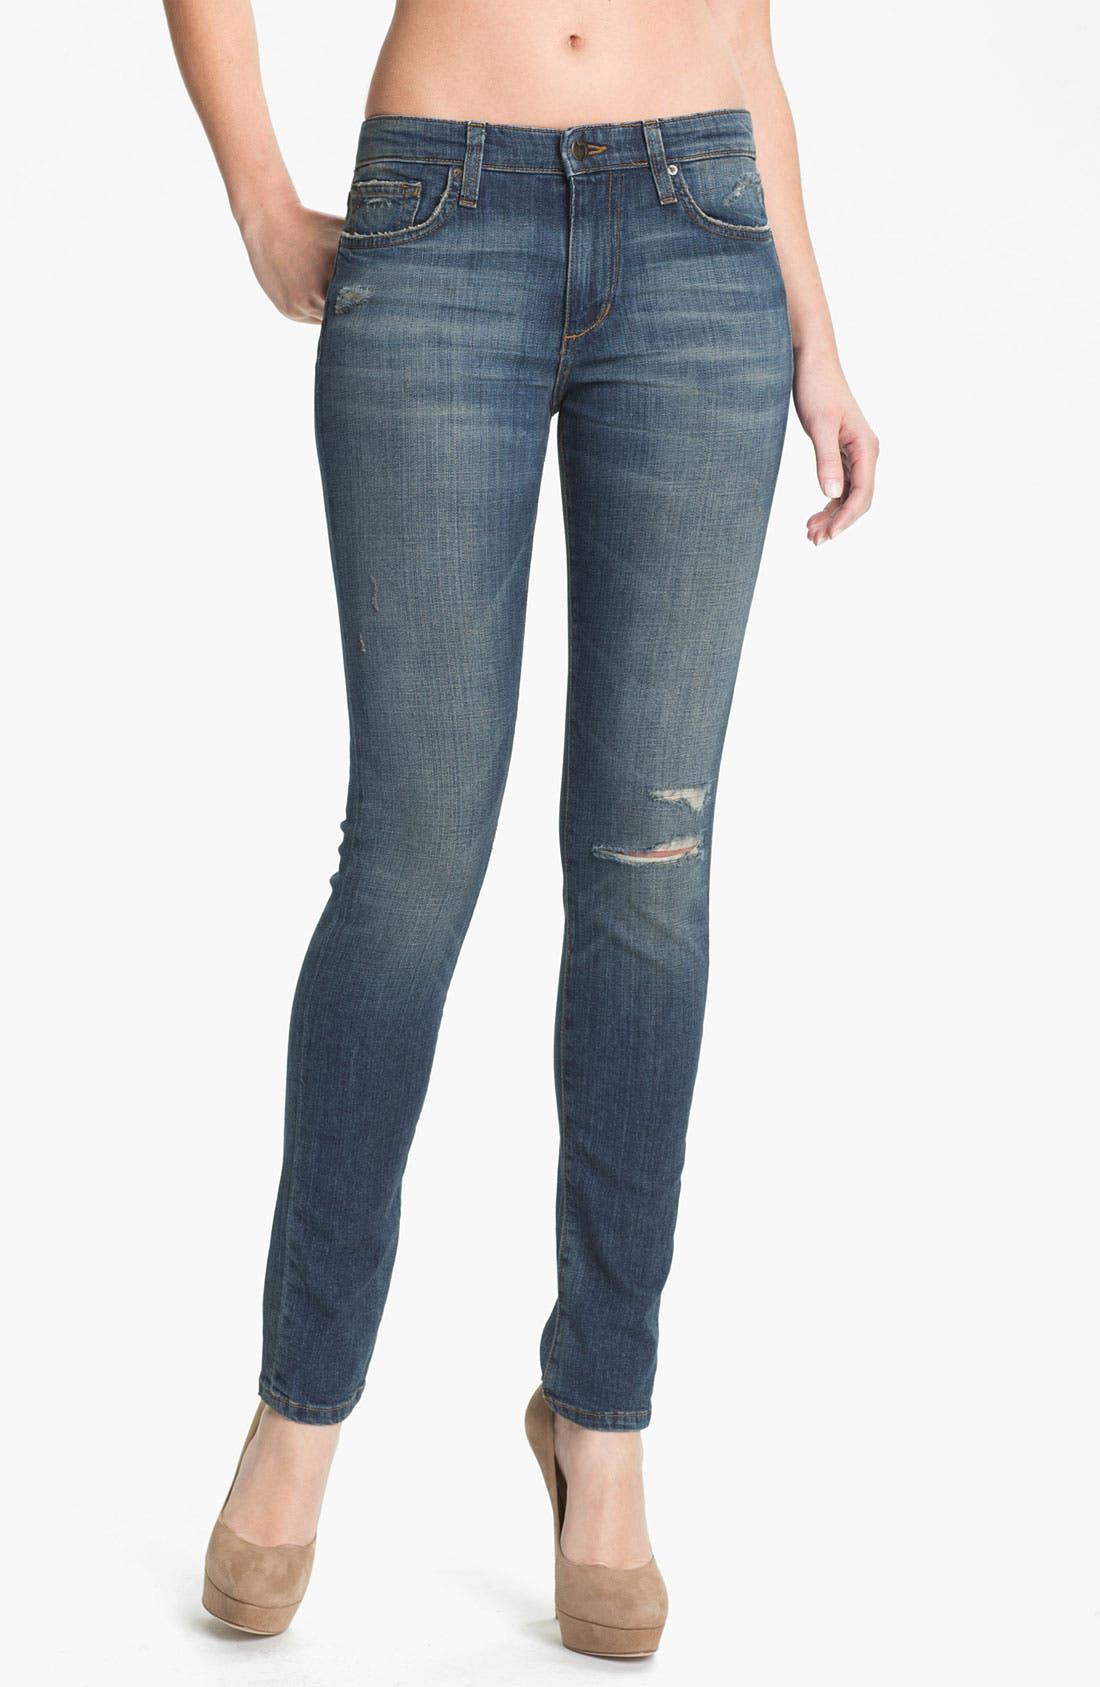 Alternate Image 1 Selected - Joe's 'Vintage Reserve' Skinny Stretch Jeans (Erika)